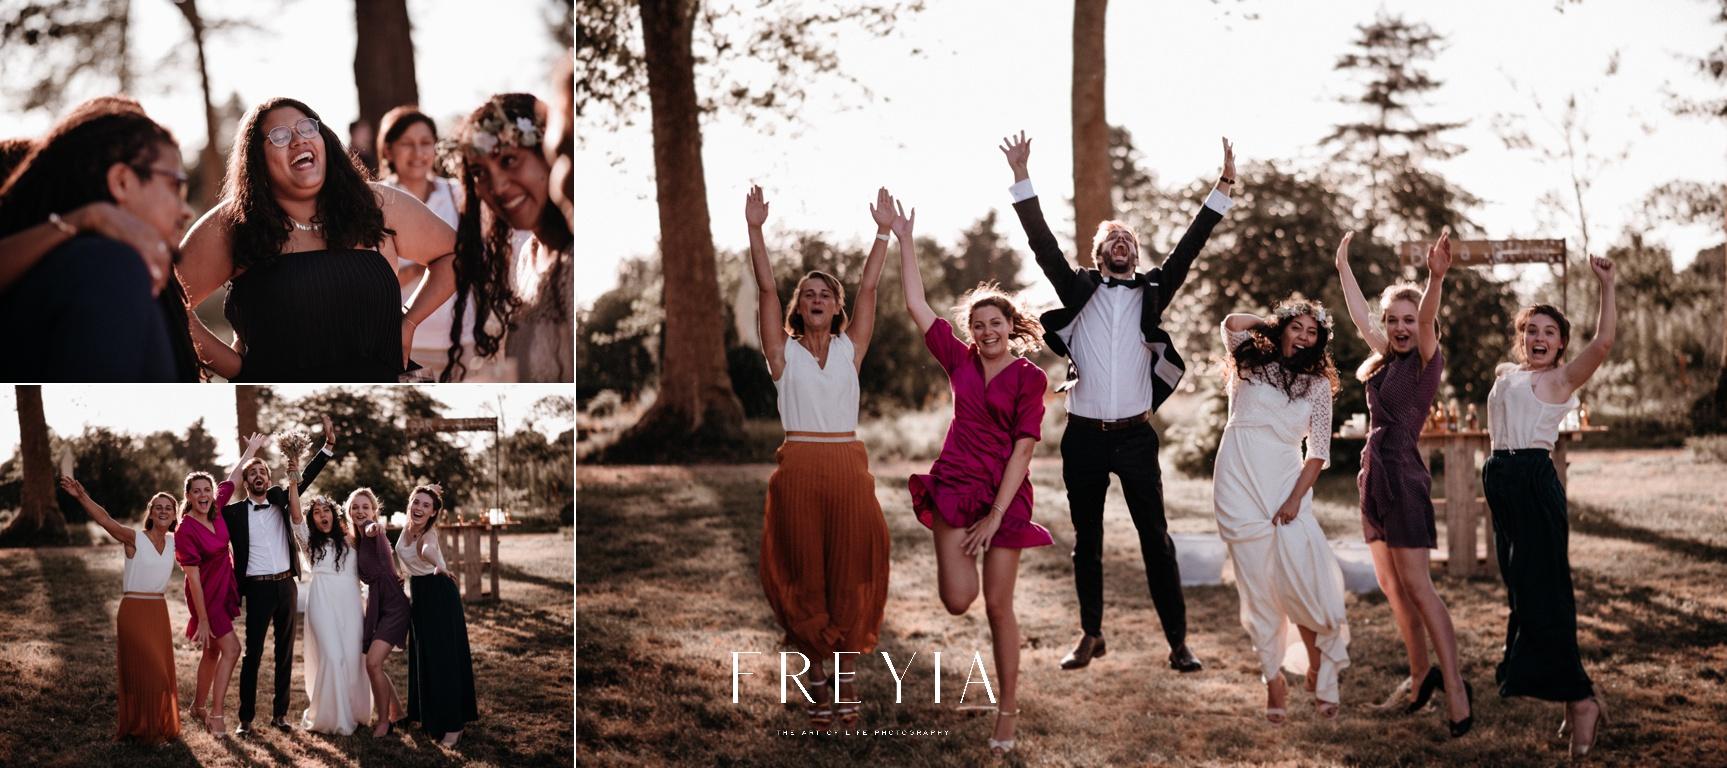 R + T |  mariage reportage alternatif moody intime minimaliste vintage naturel boho boheme |  PHOTOGRAPHE mariage PARIS france destination  | FREYIA photography_-248.jpg